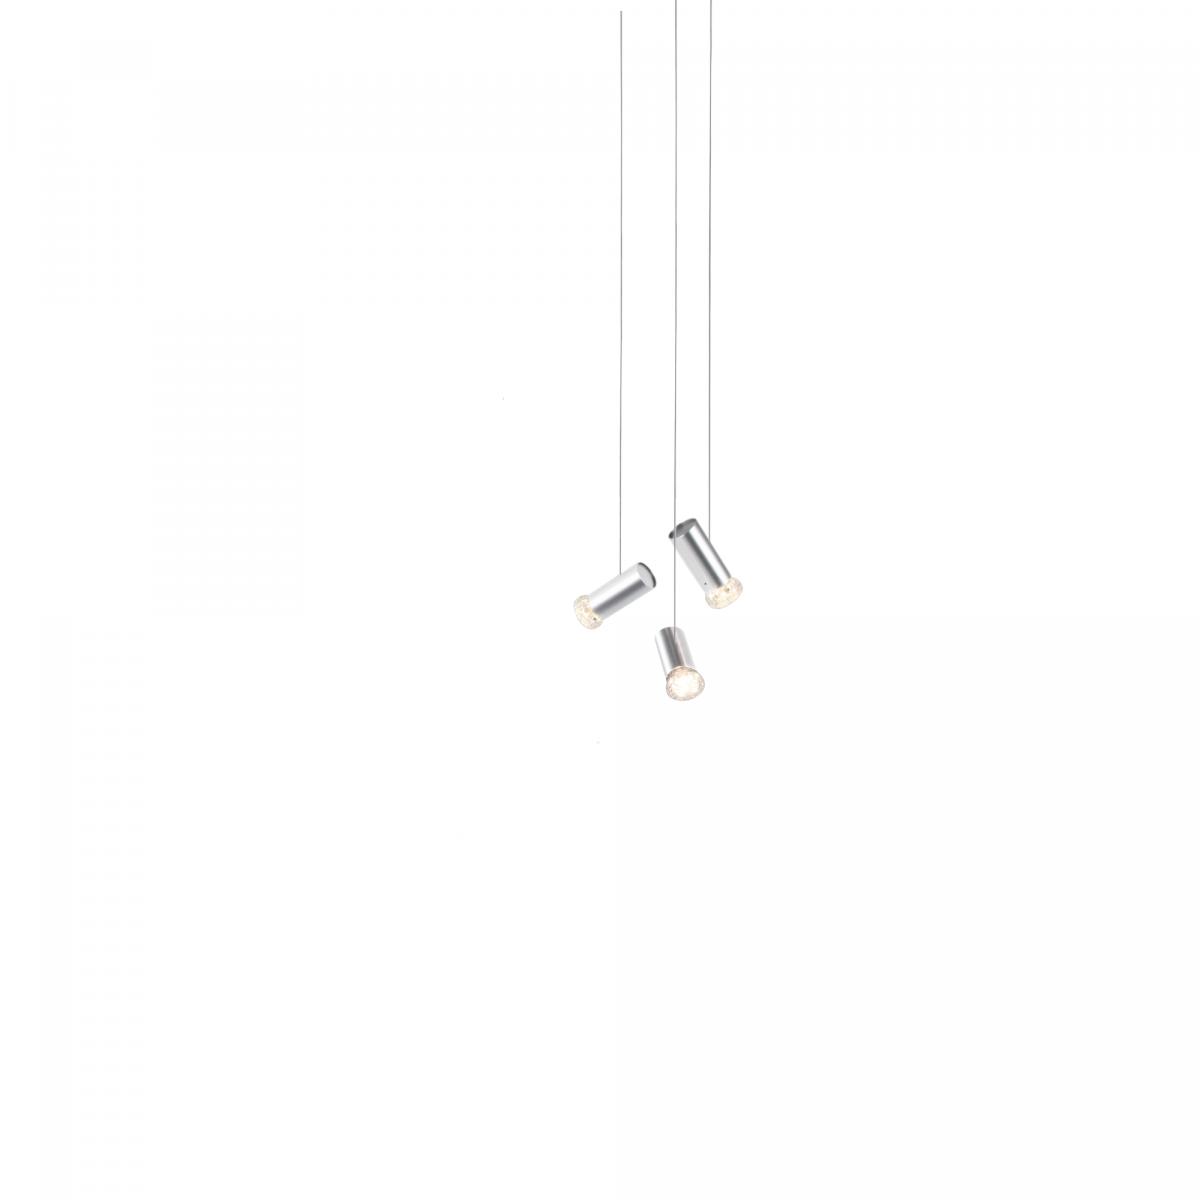 JSPR Jewels Angled 3 Silver